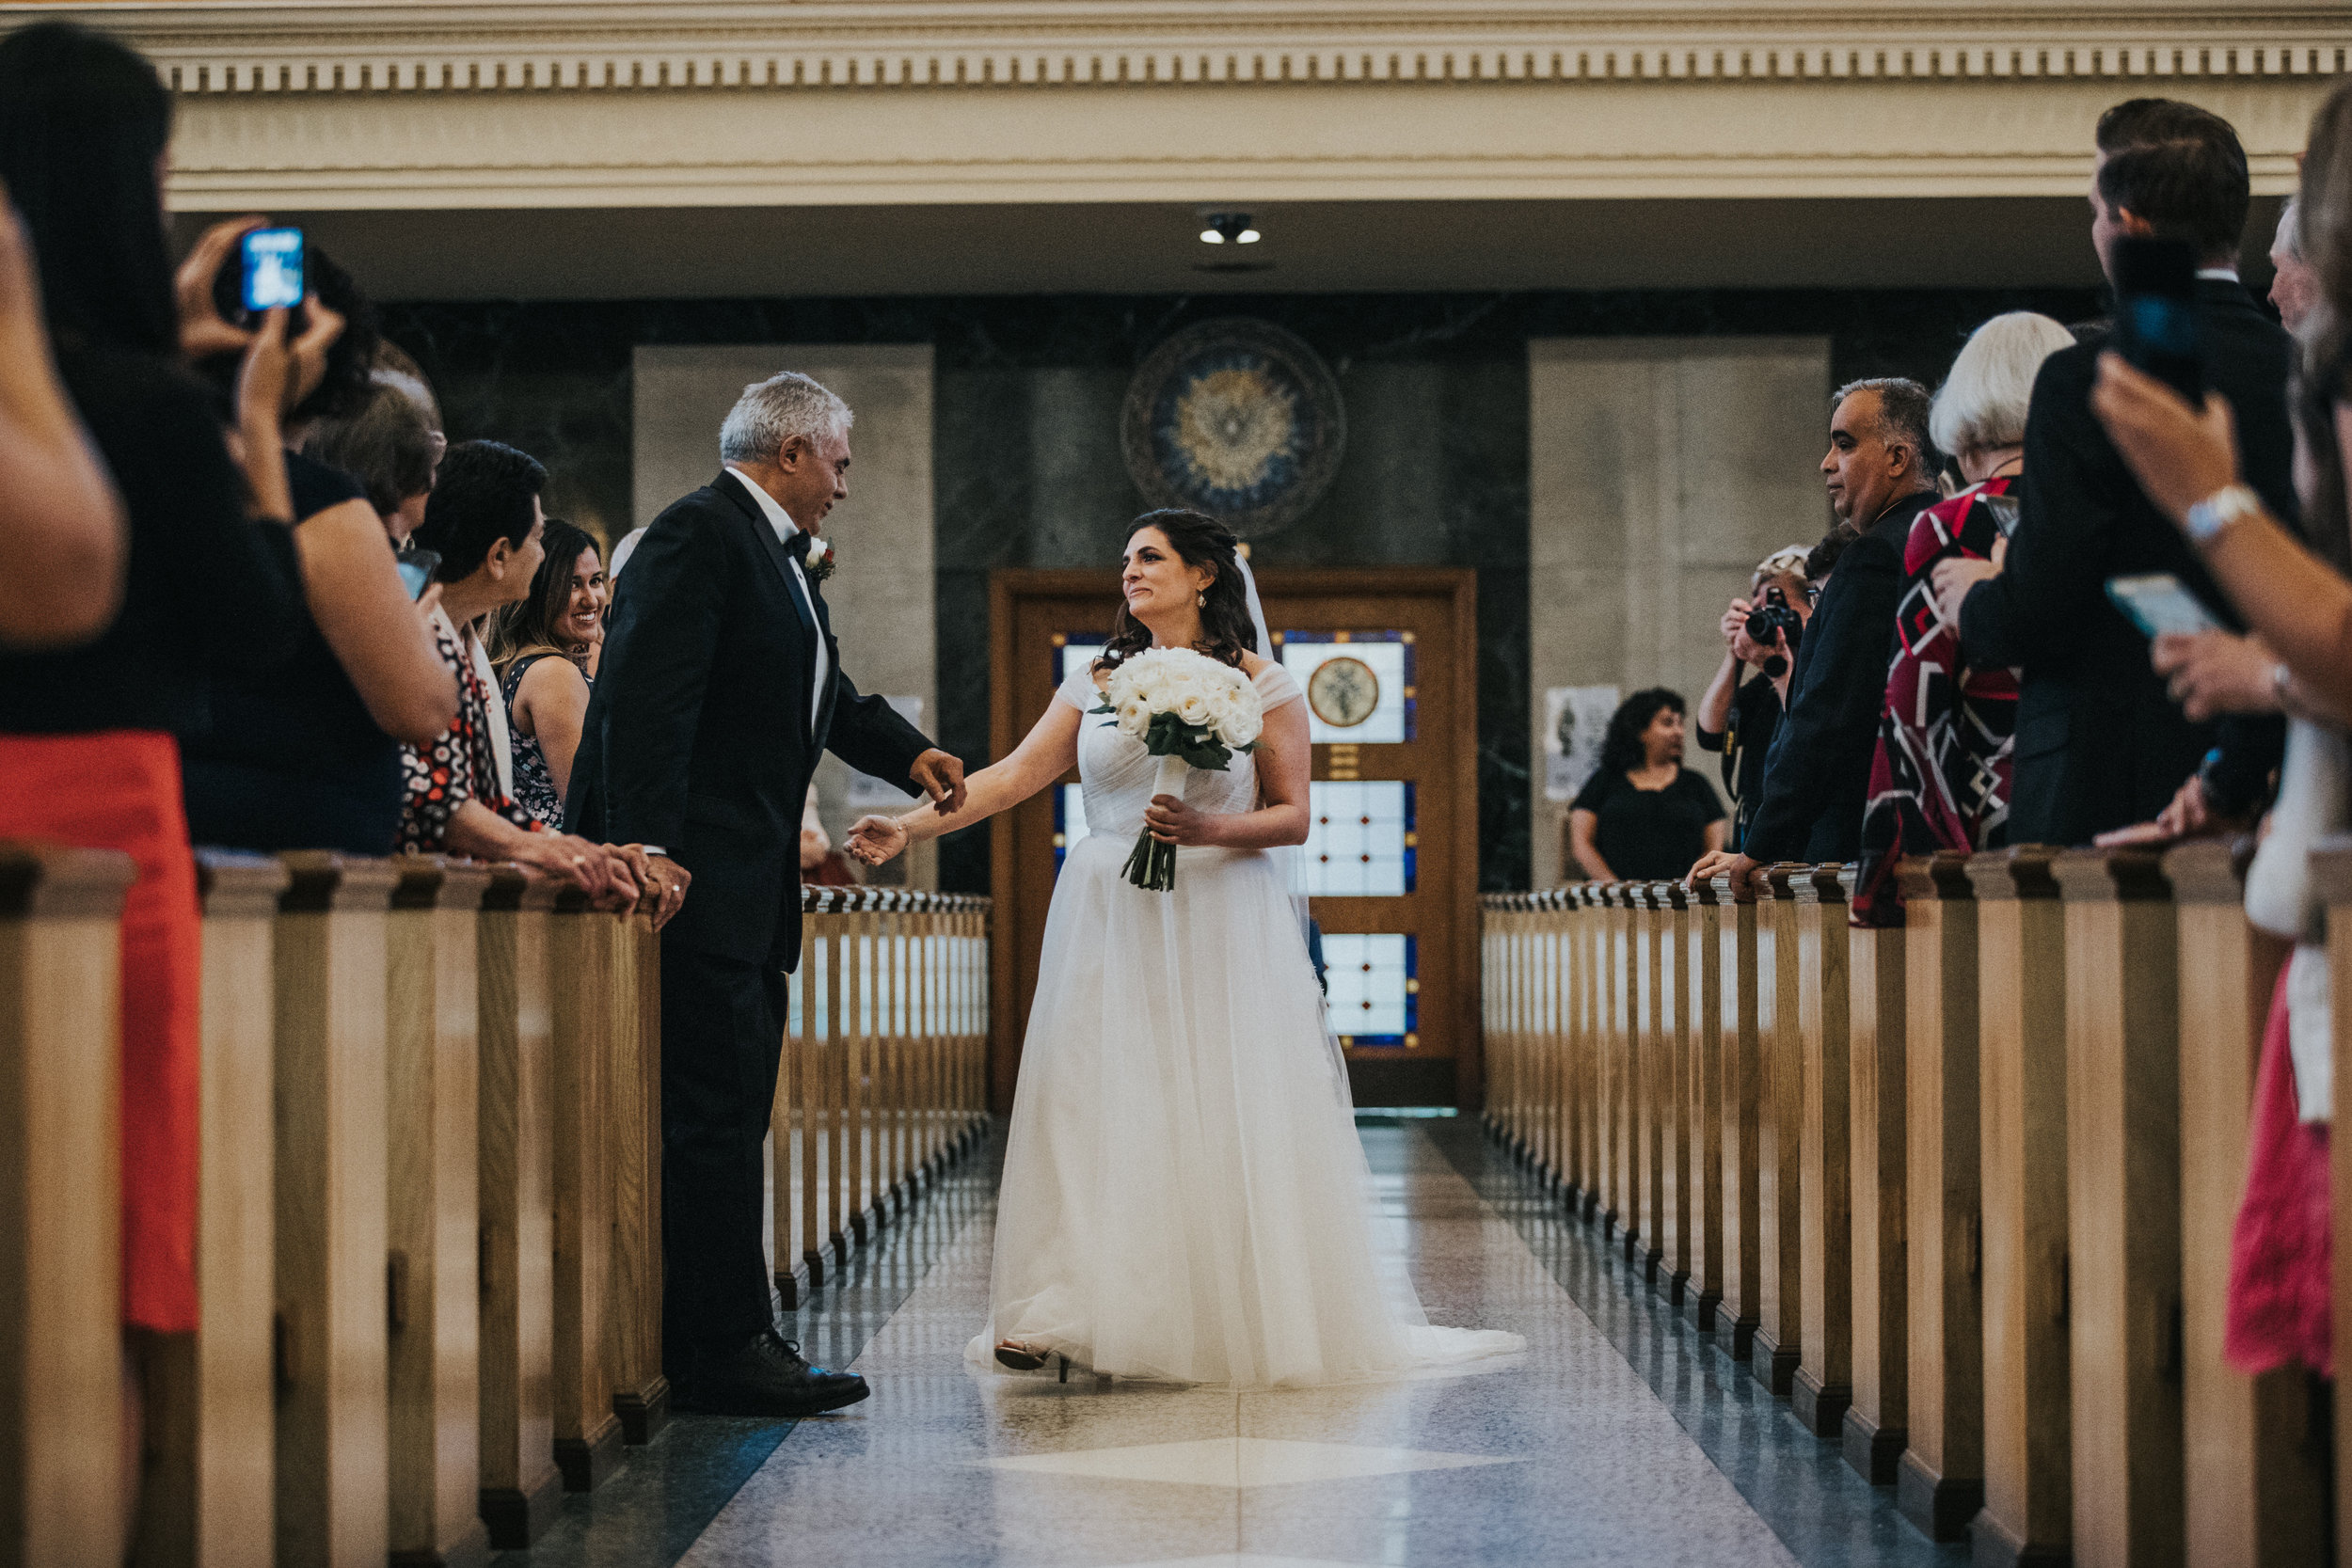 JennaLynnPhotography-NJWeddingPhotographer-Philadelphia-Wedding-ArtsBallroom-Ceremony-22.jpg